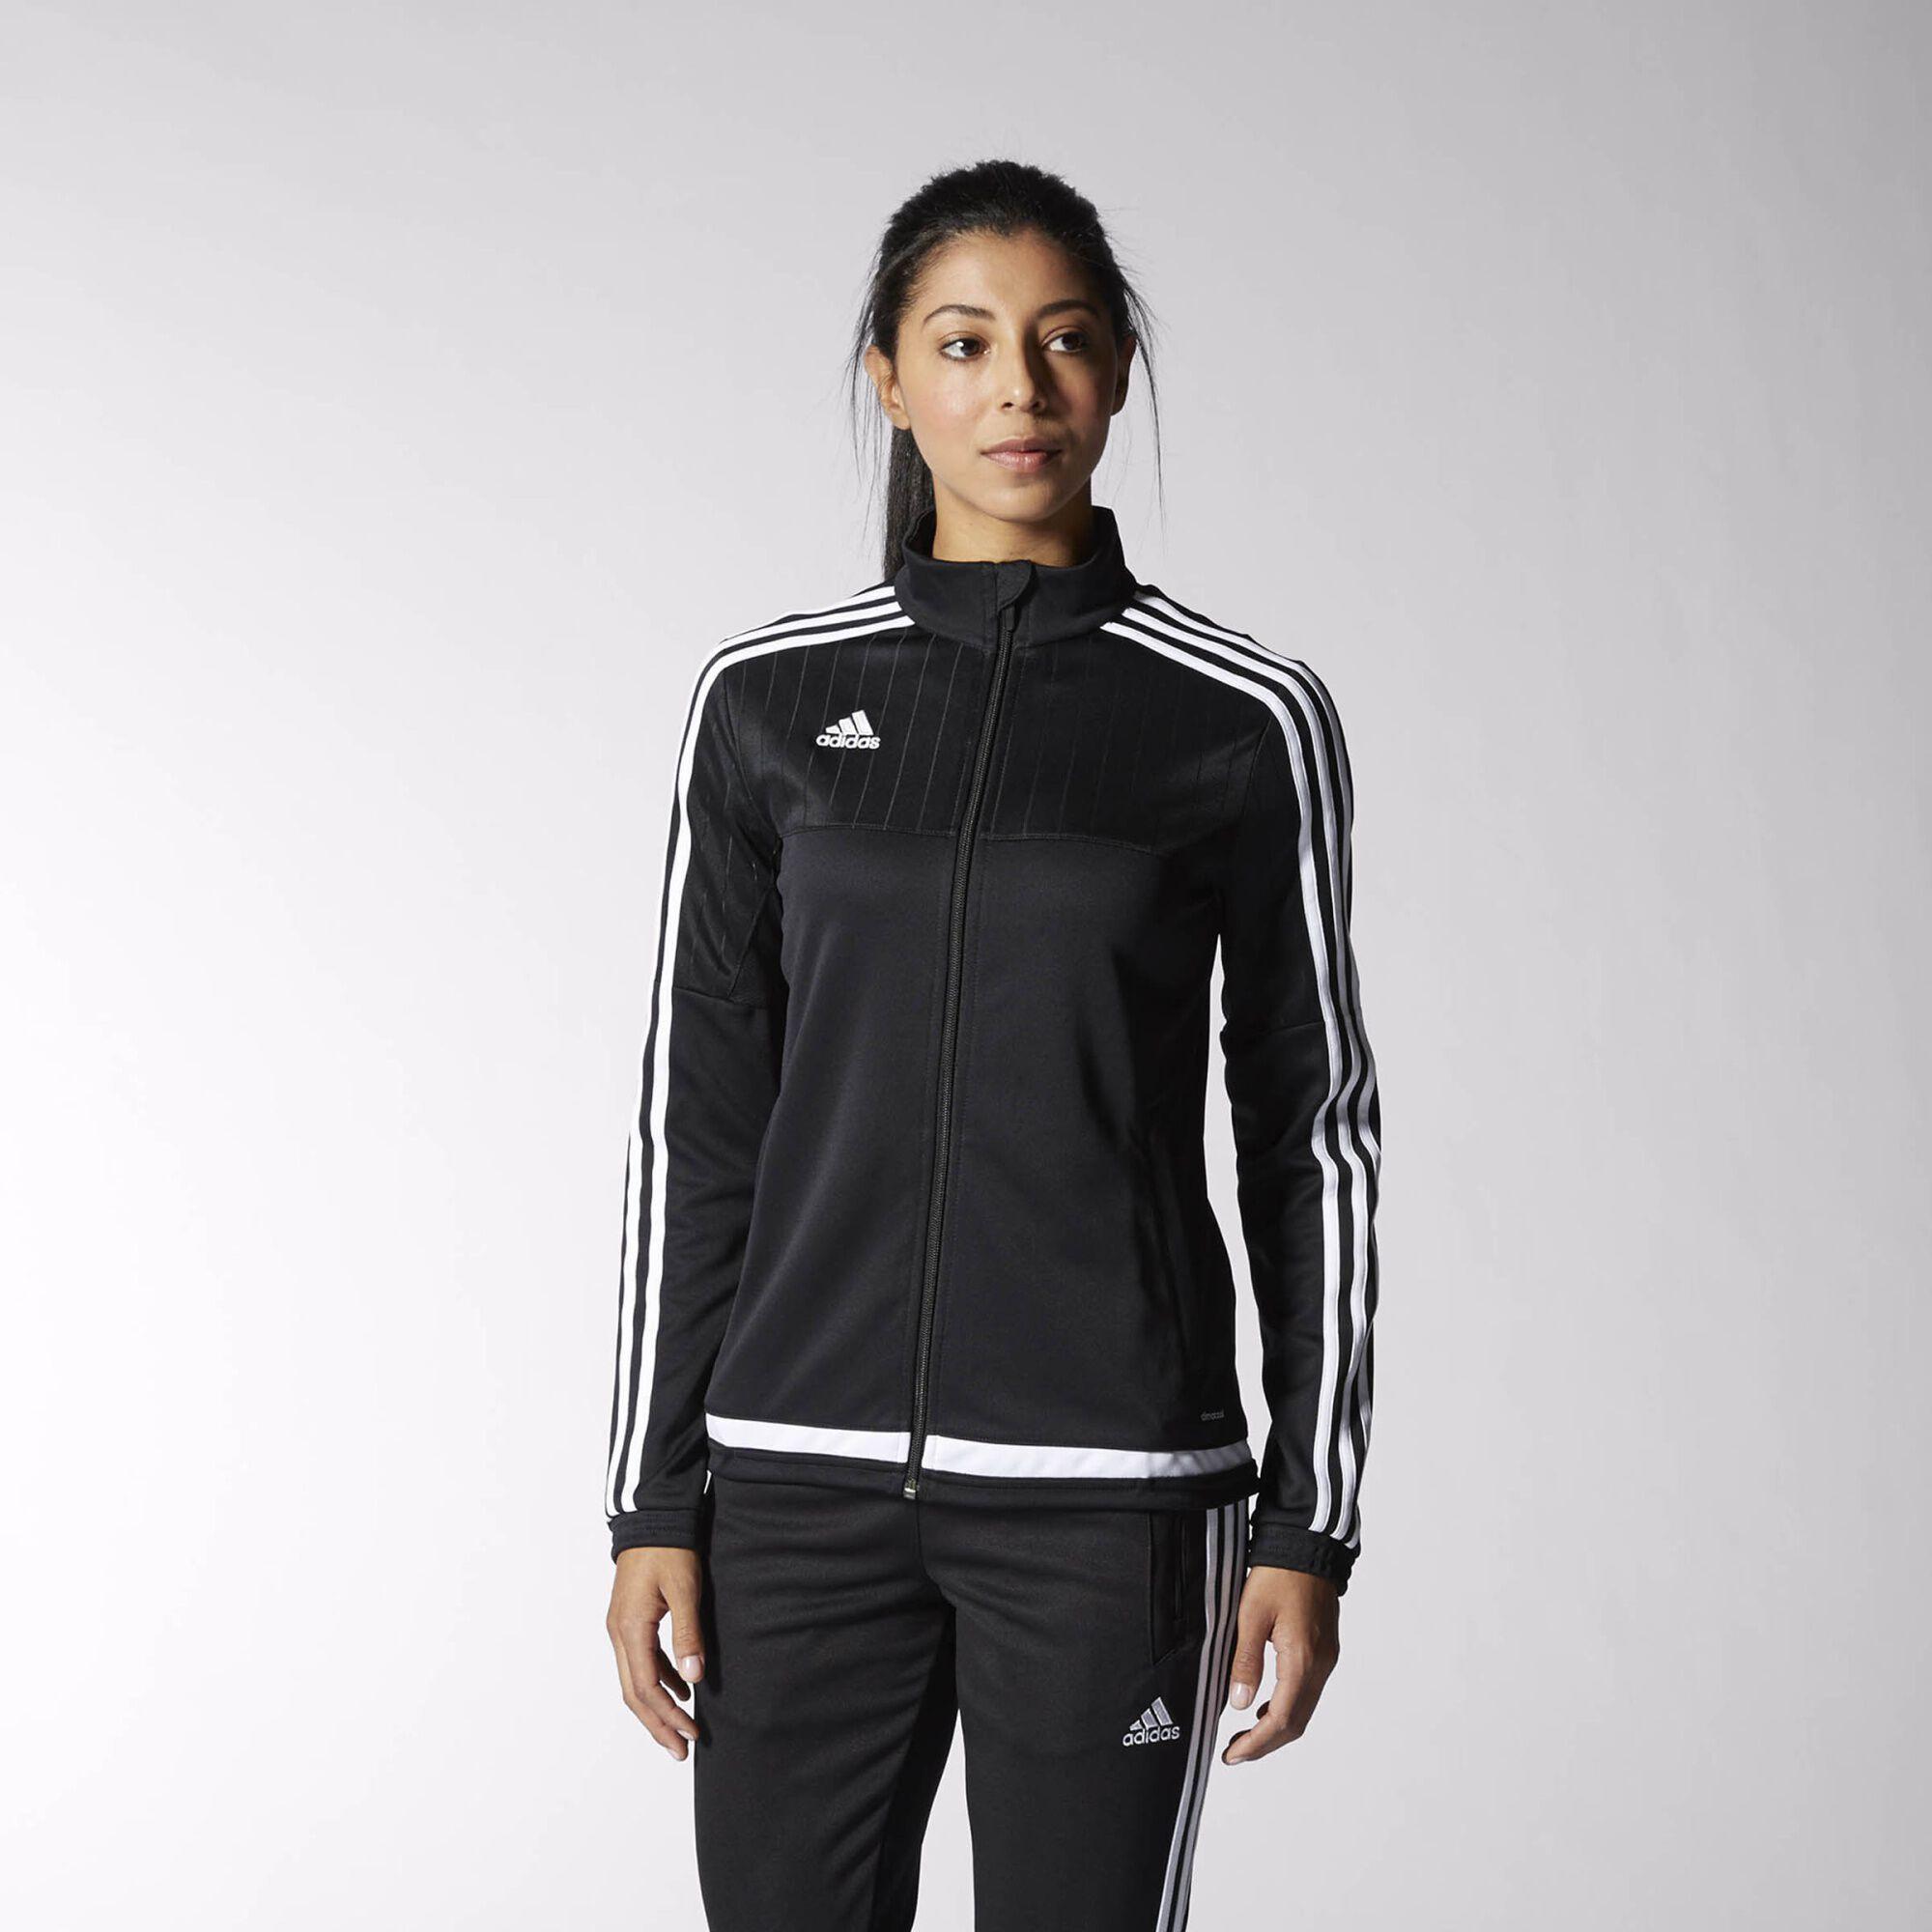 Adidas tiro 15 training jacket black white black m64058